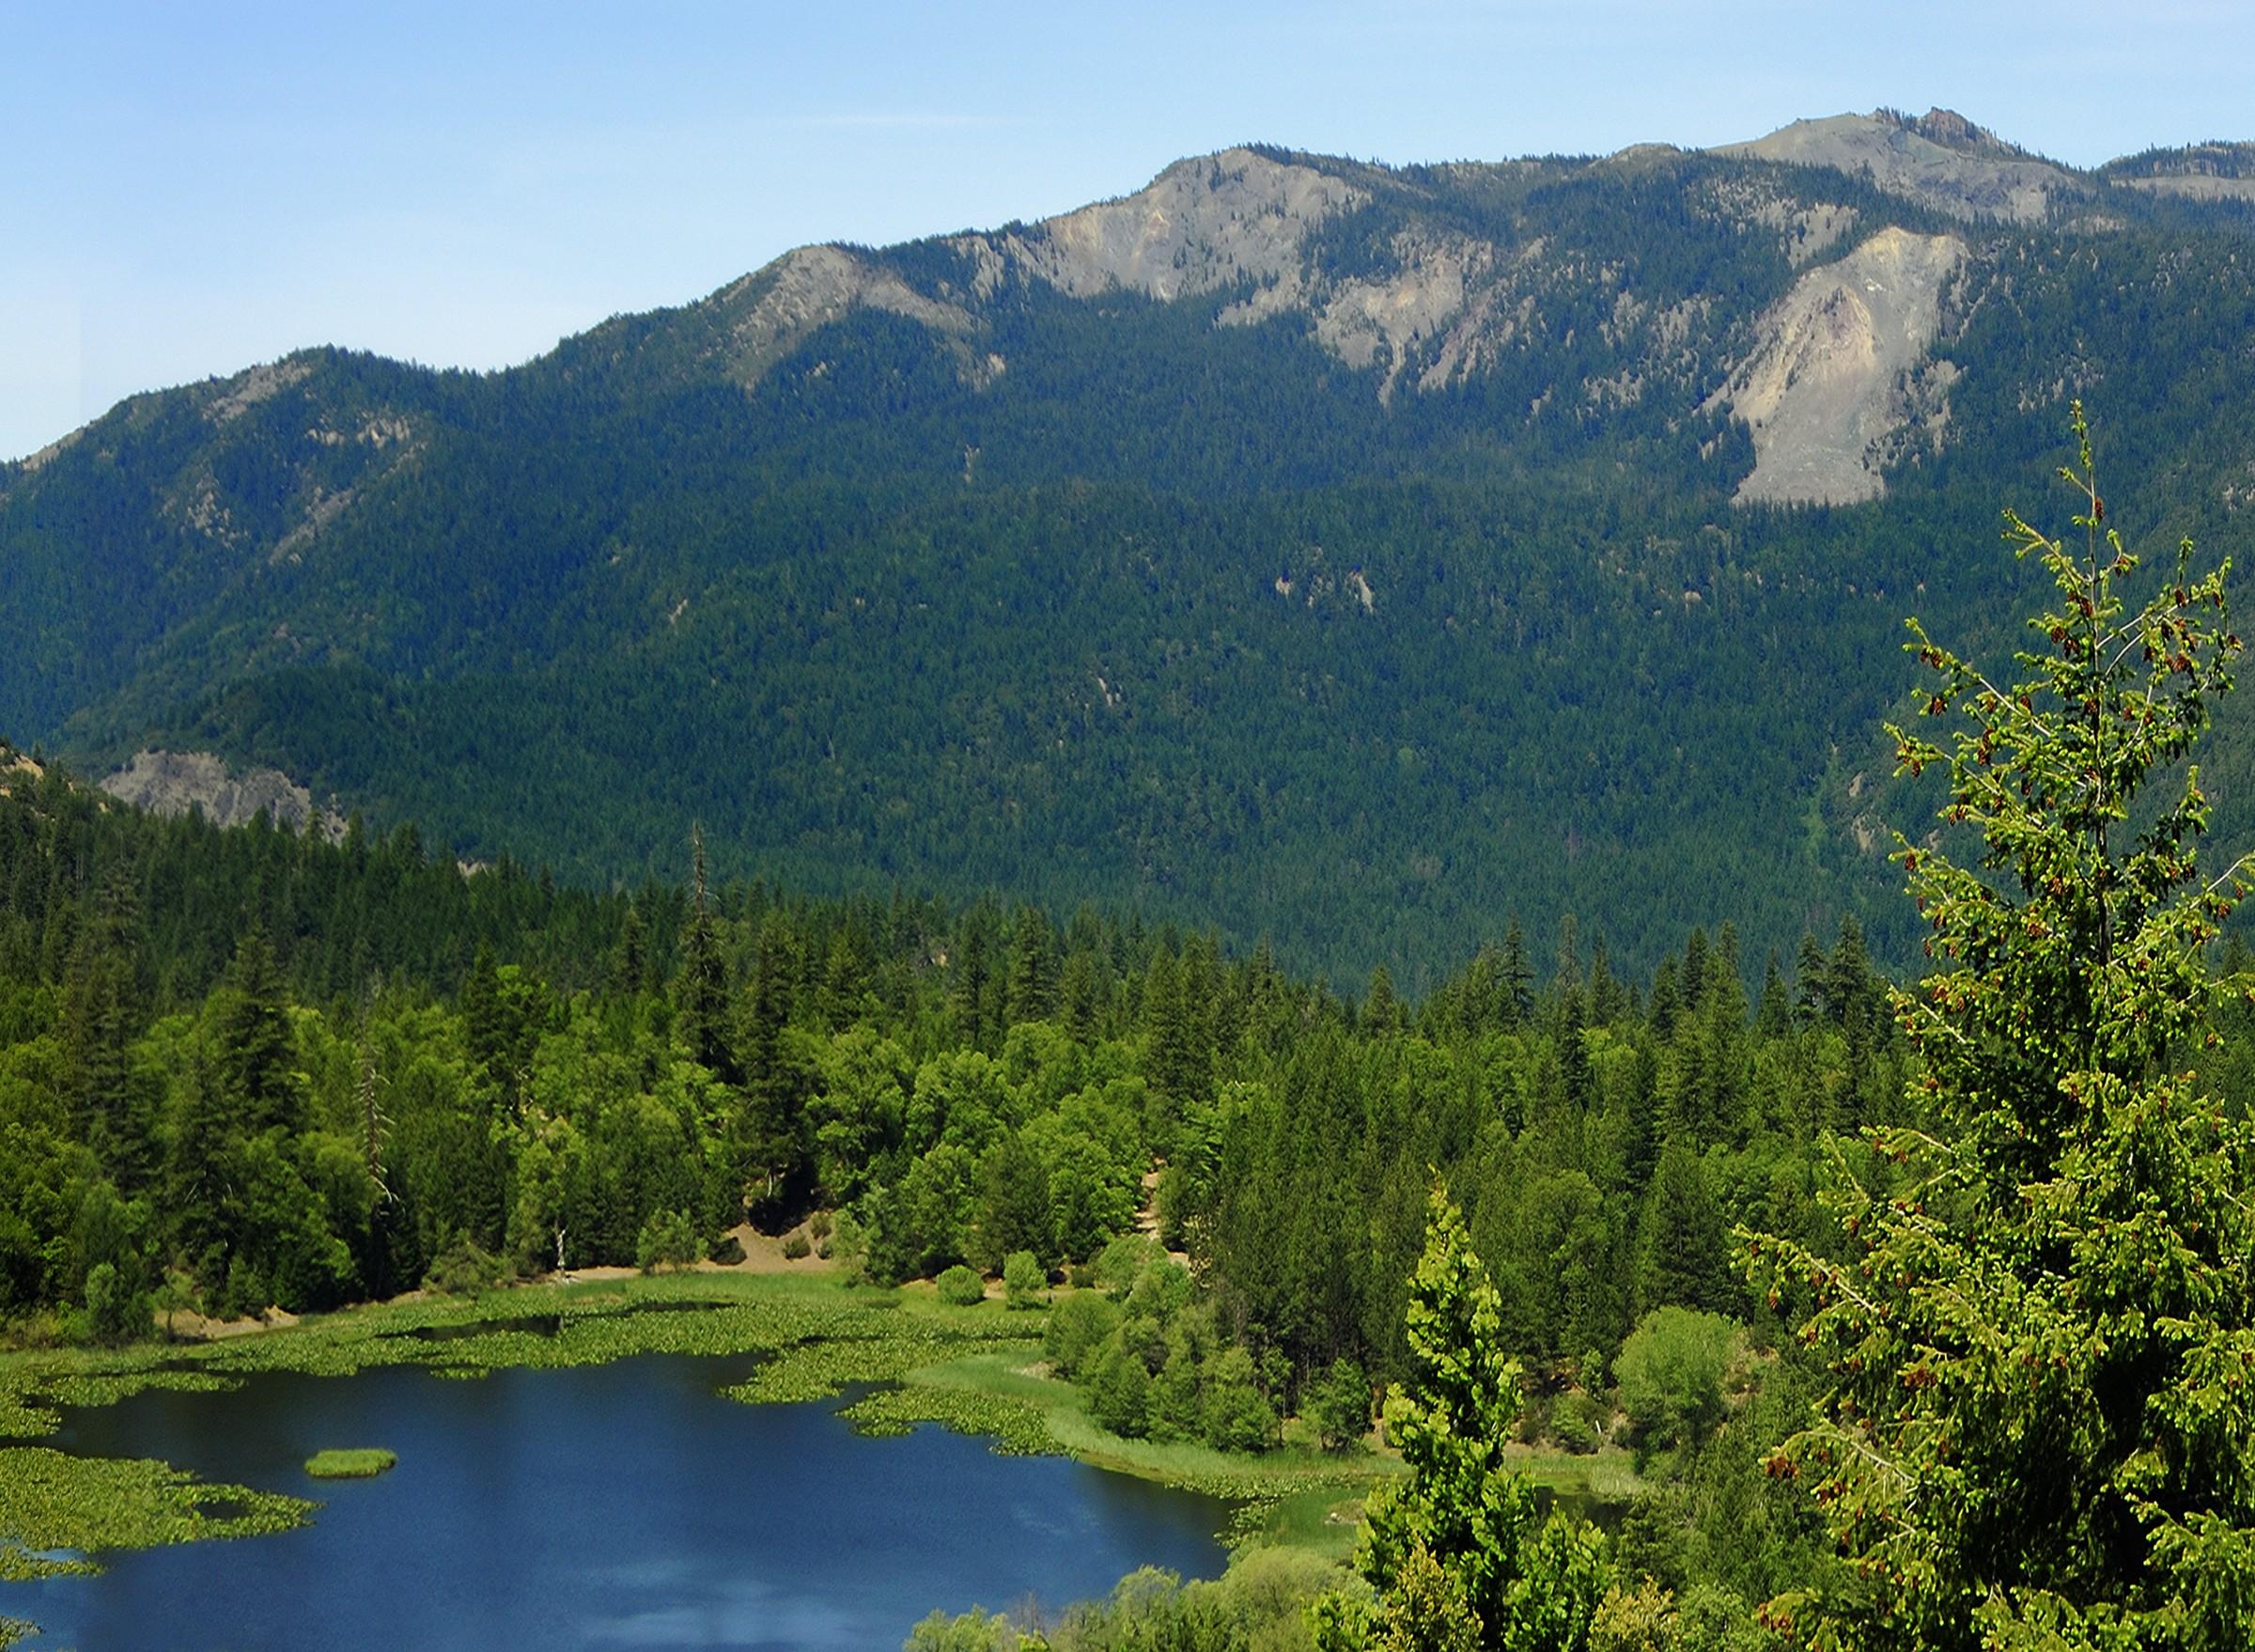 howard lake (mendocino county) - wikipedia